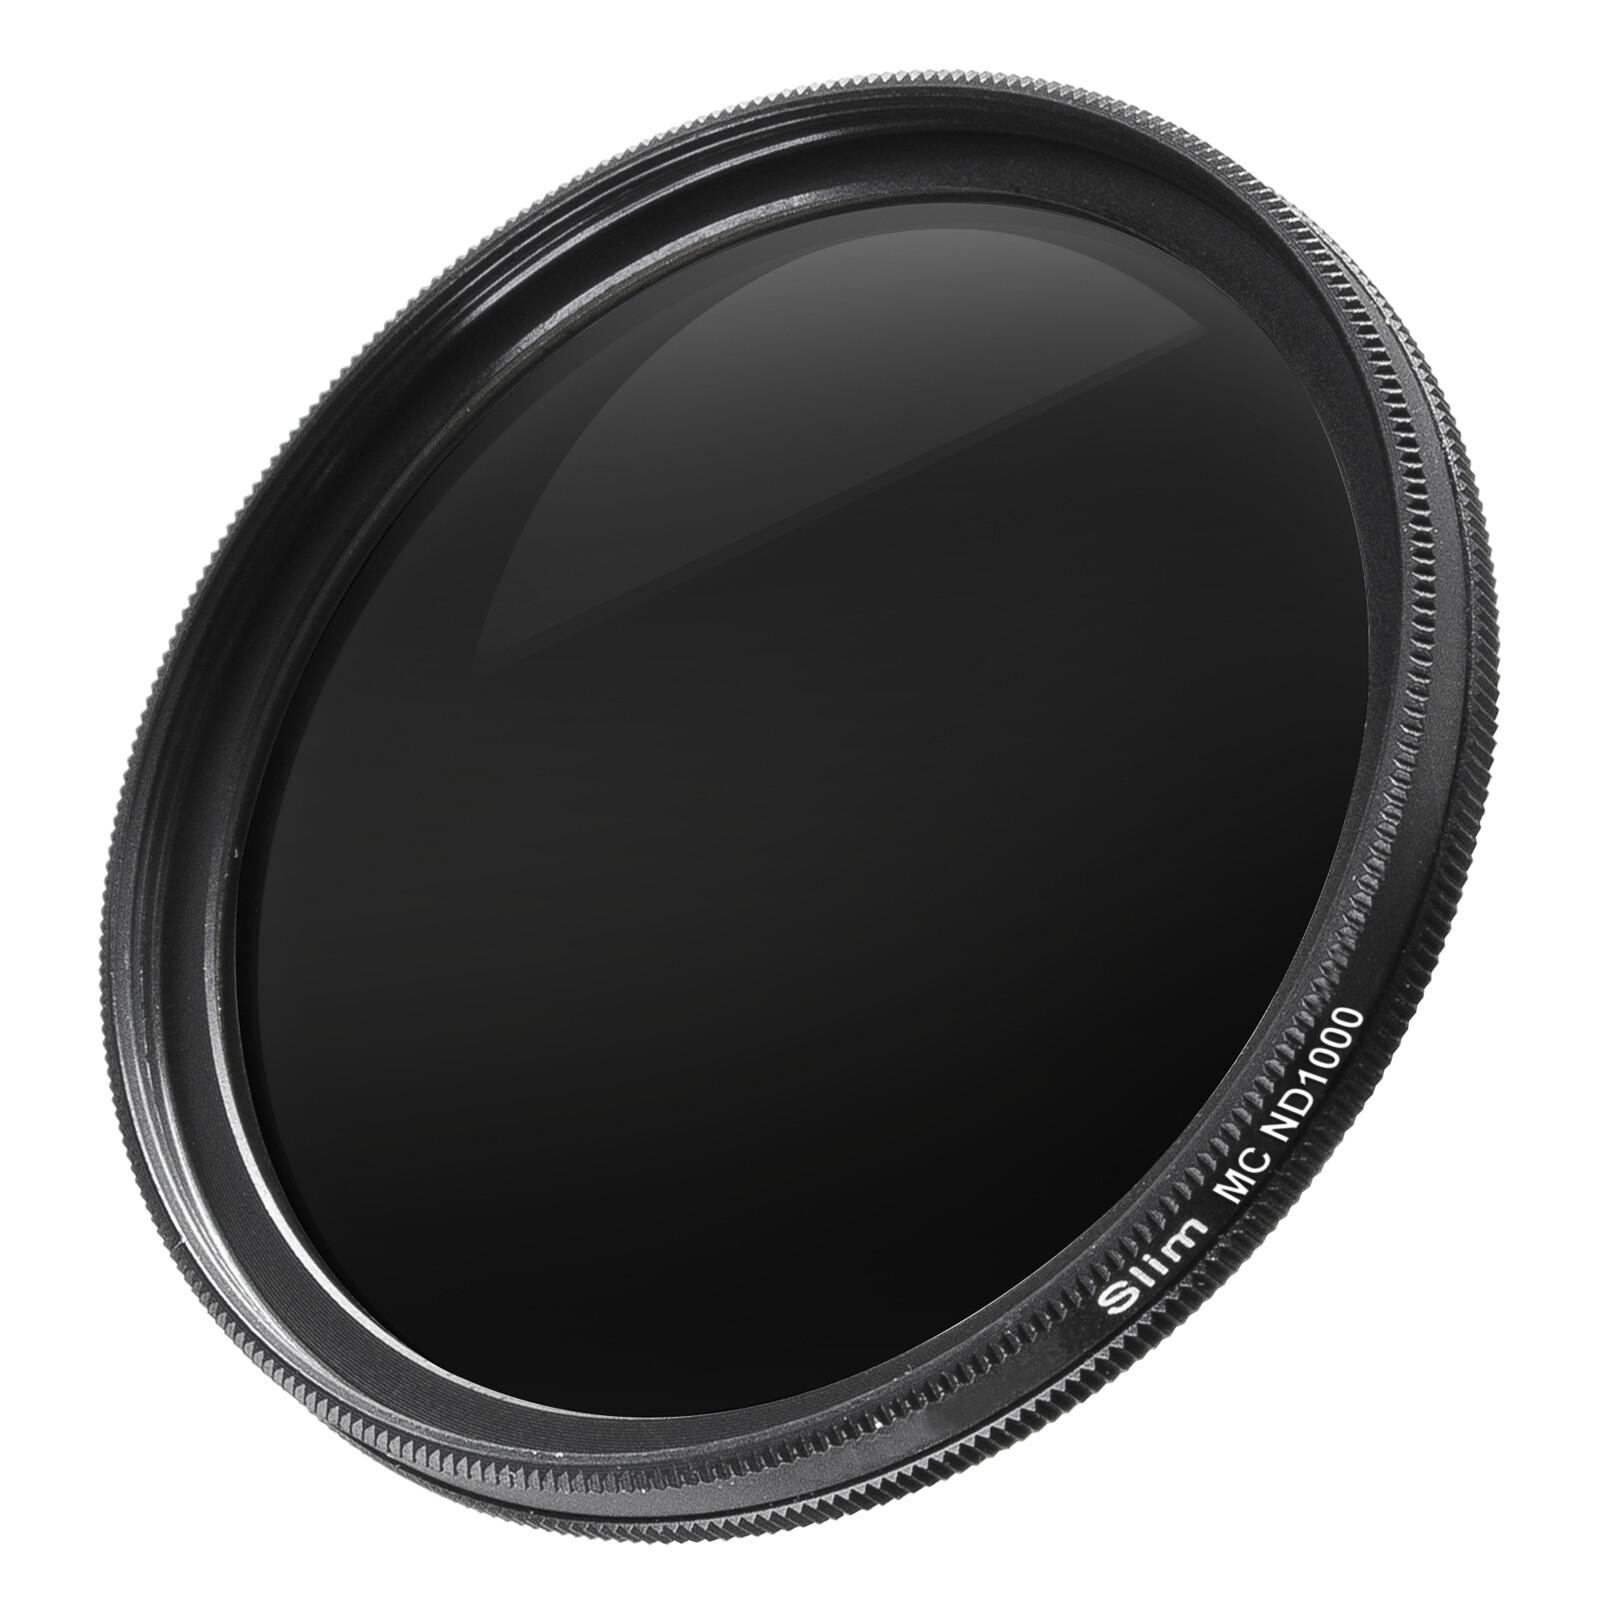 walimex pro Slim Graufilter ND1000 vergütet 82 mm